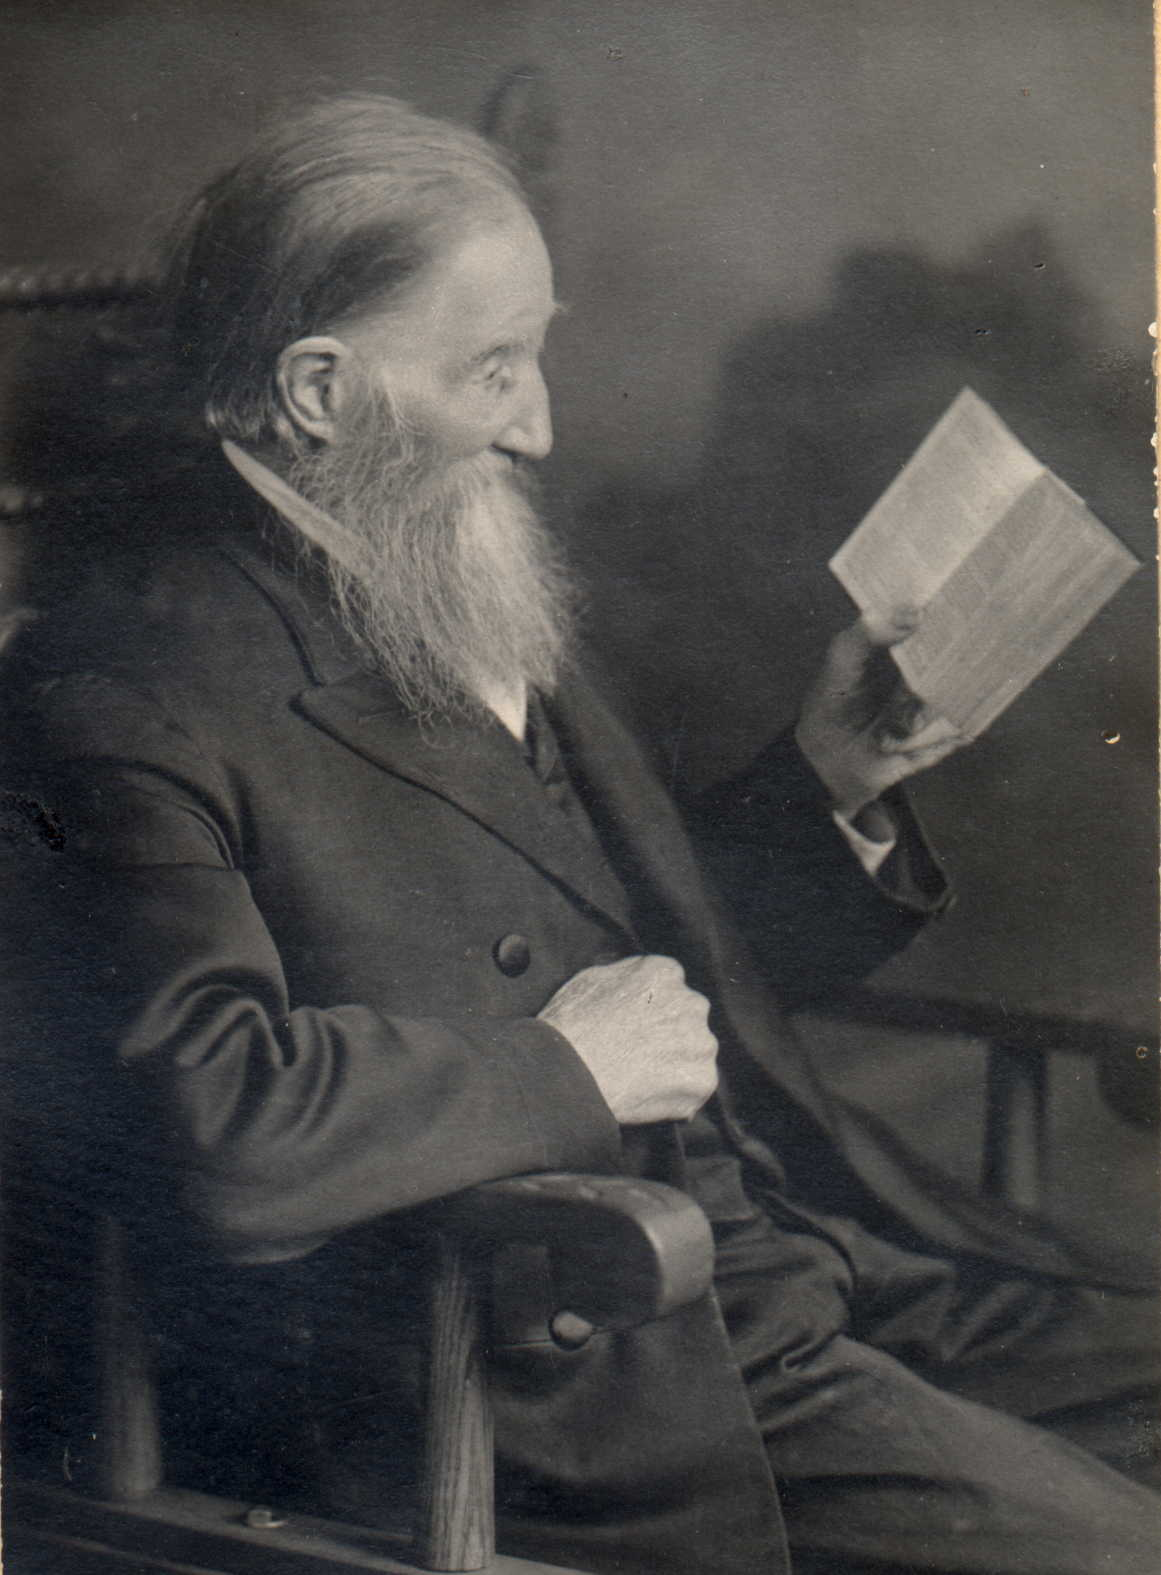 Rev. Bersvend Anderson